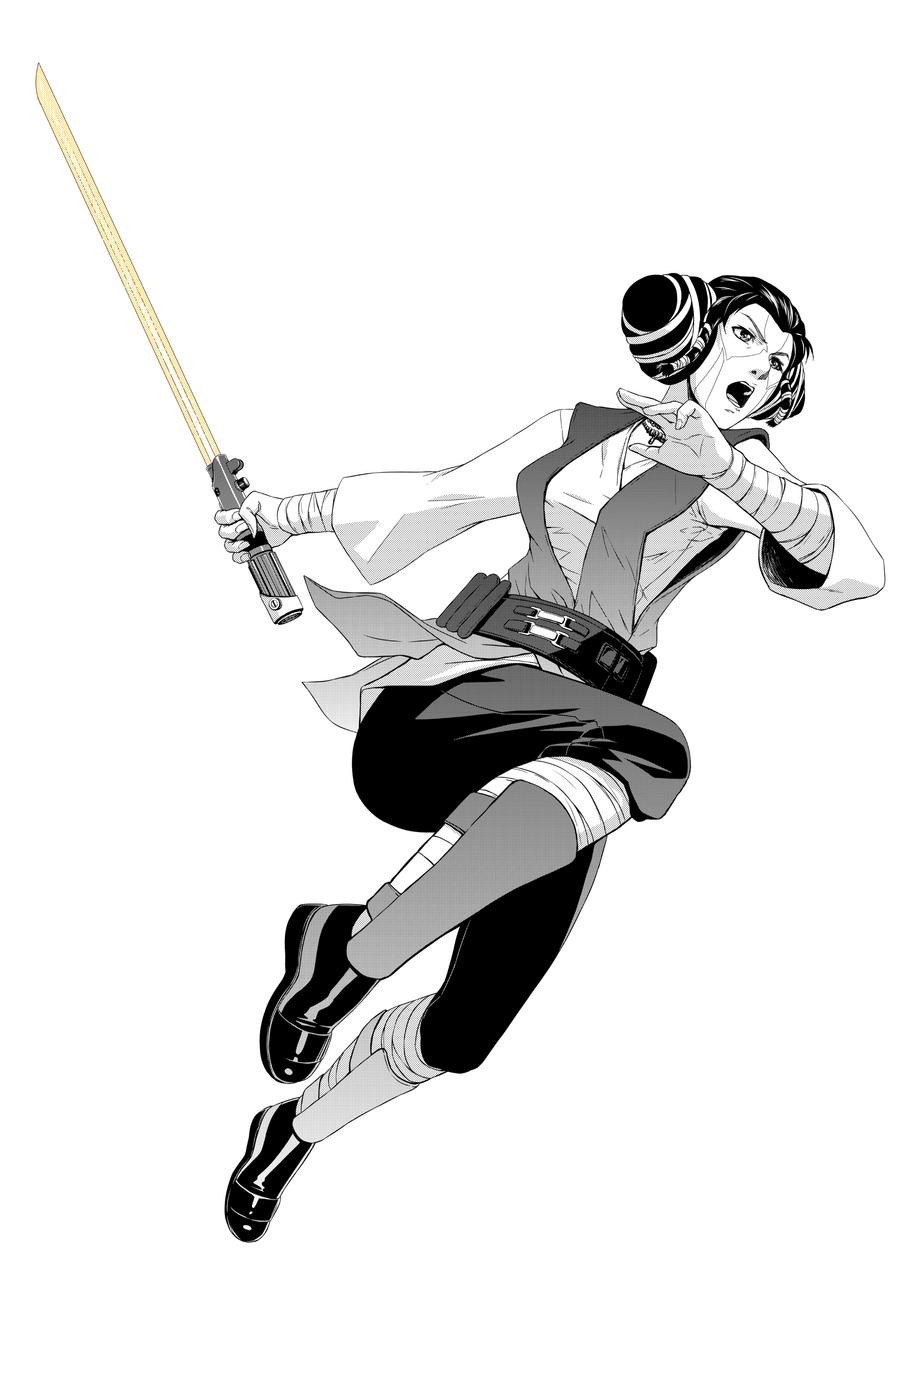 Star Wars Jedi Mavra Zane by Aliens-of-Star-Wars